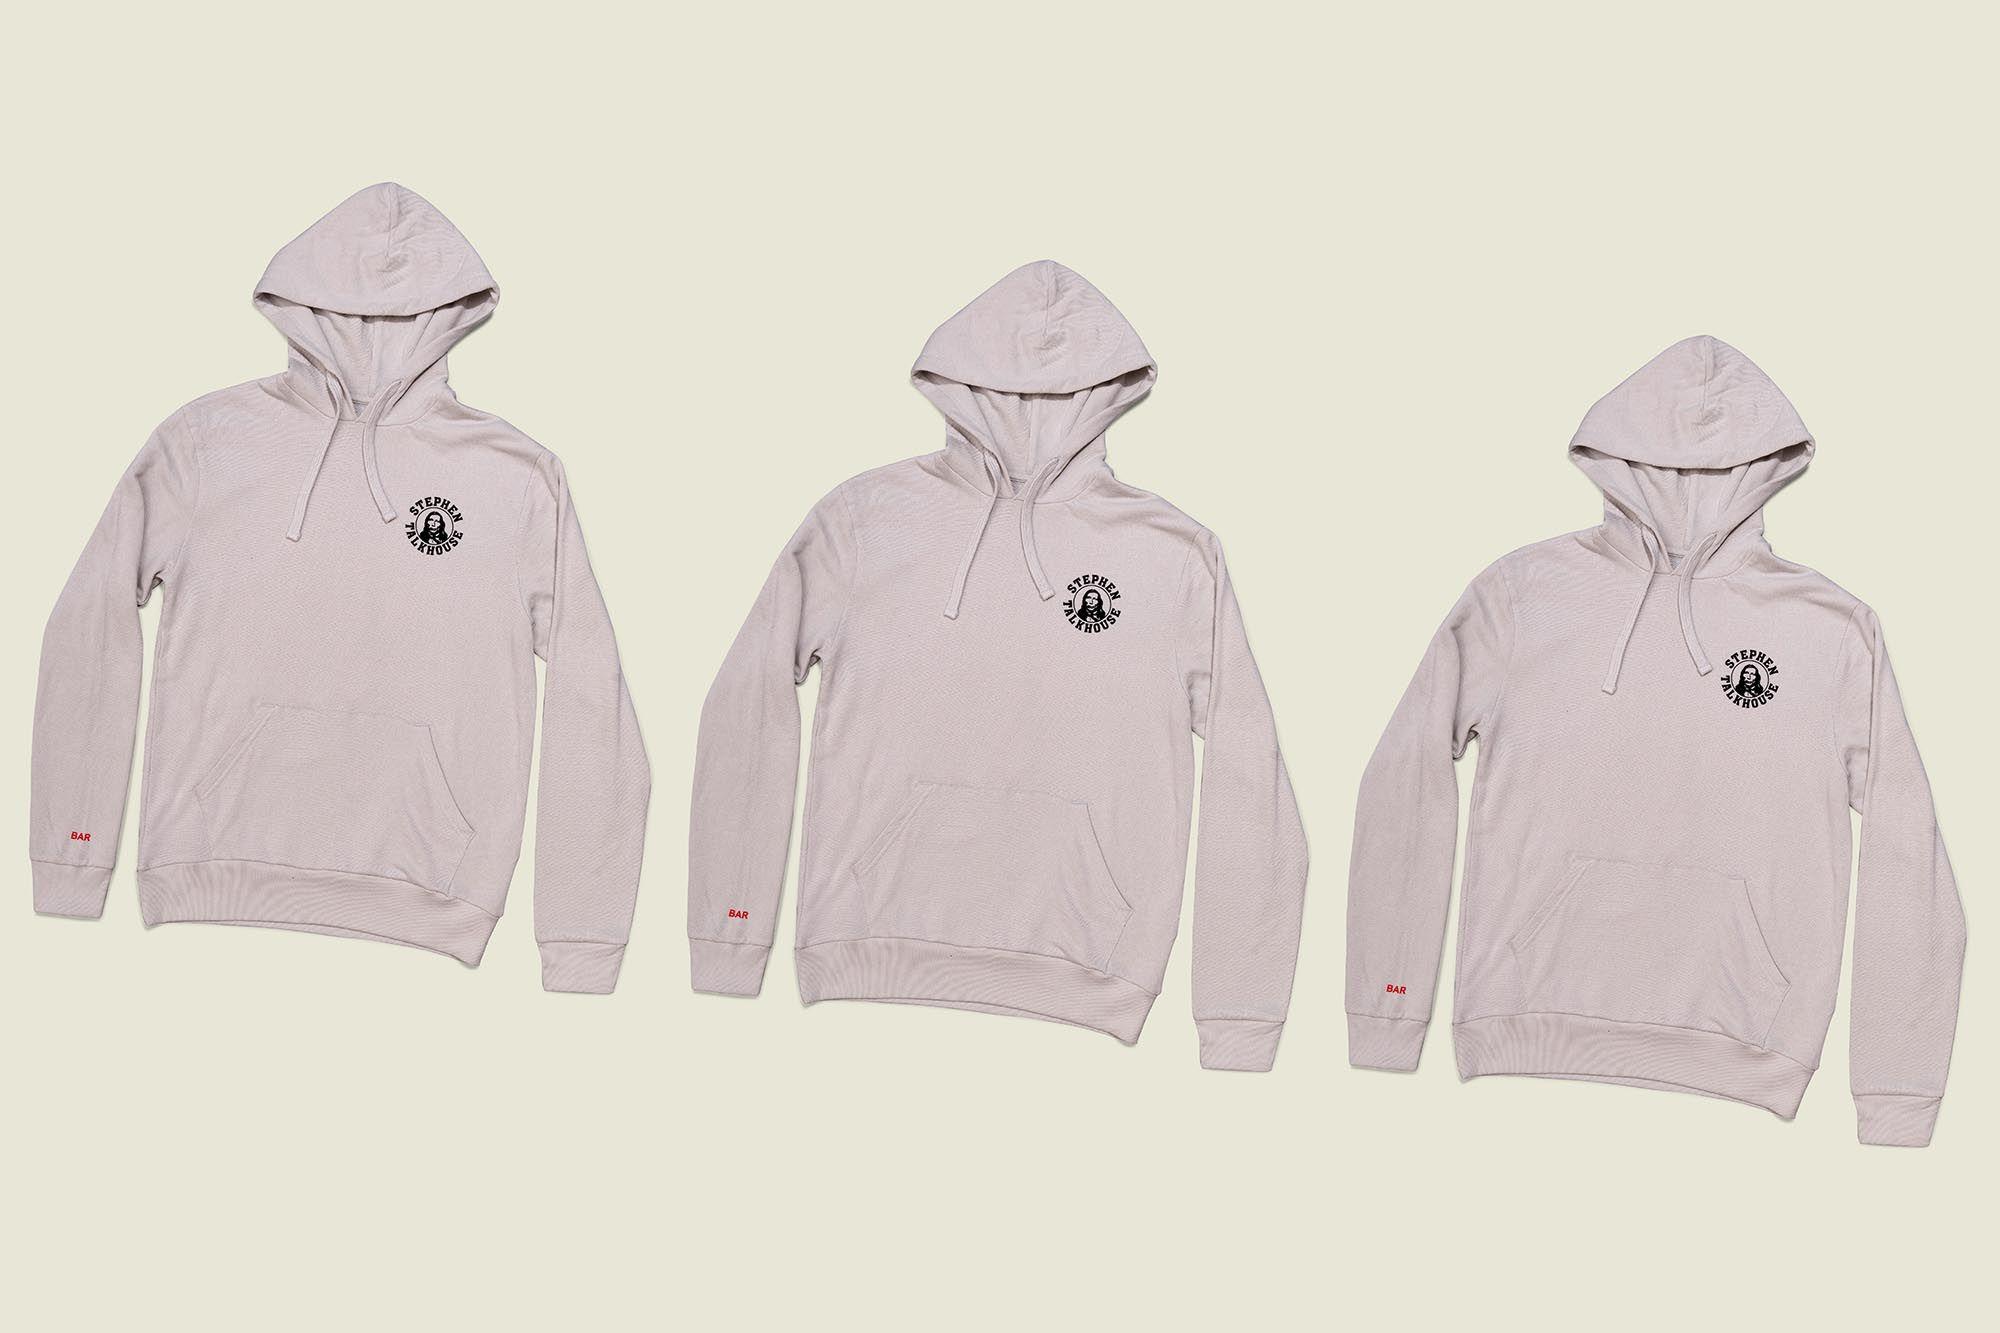 Three pullover hoodies